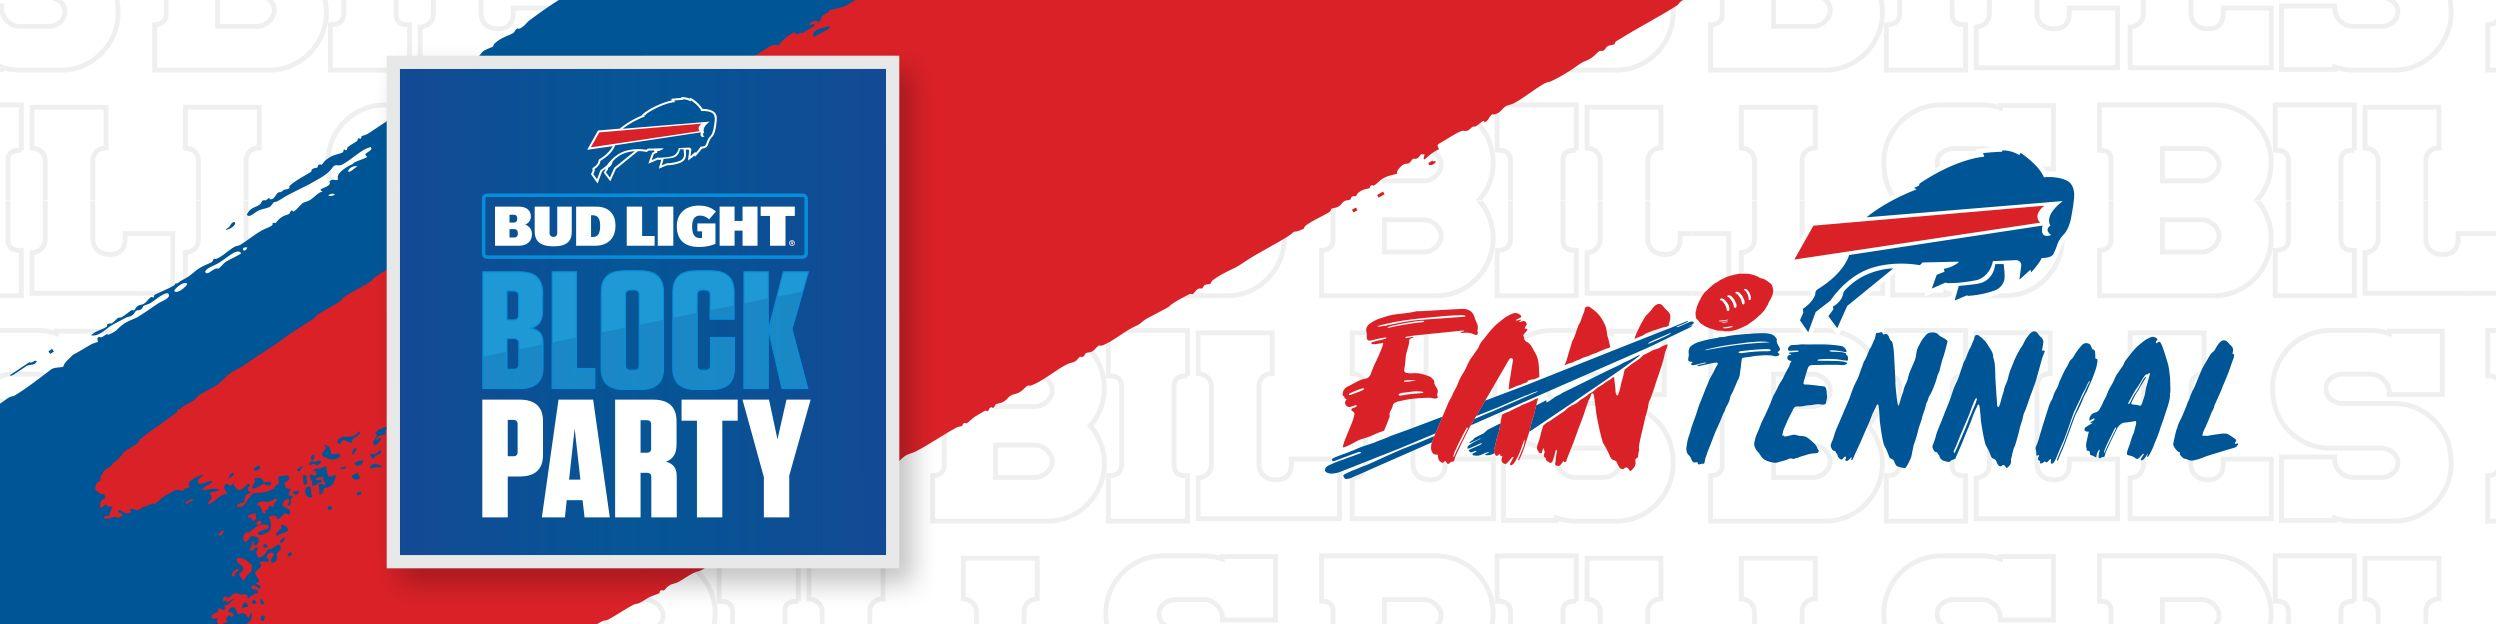 BBMKT-02806_-_Bud_Light_Block_Party_-_New_Size